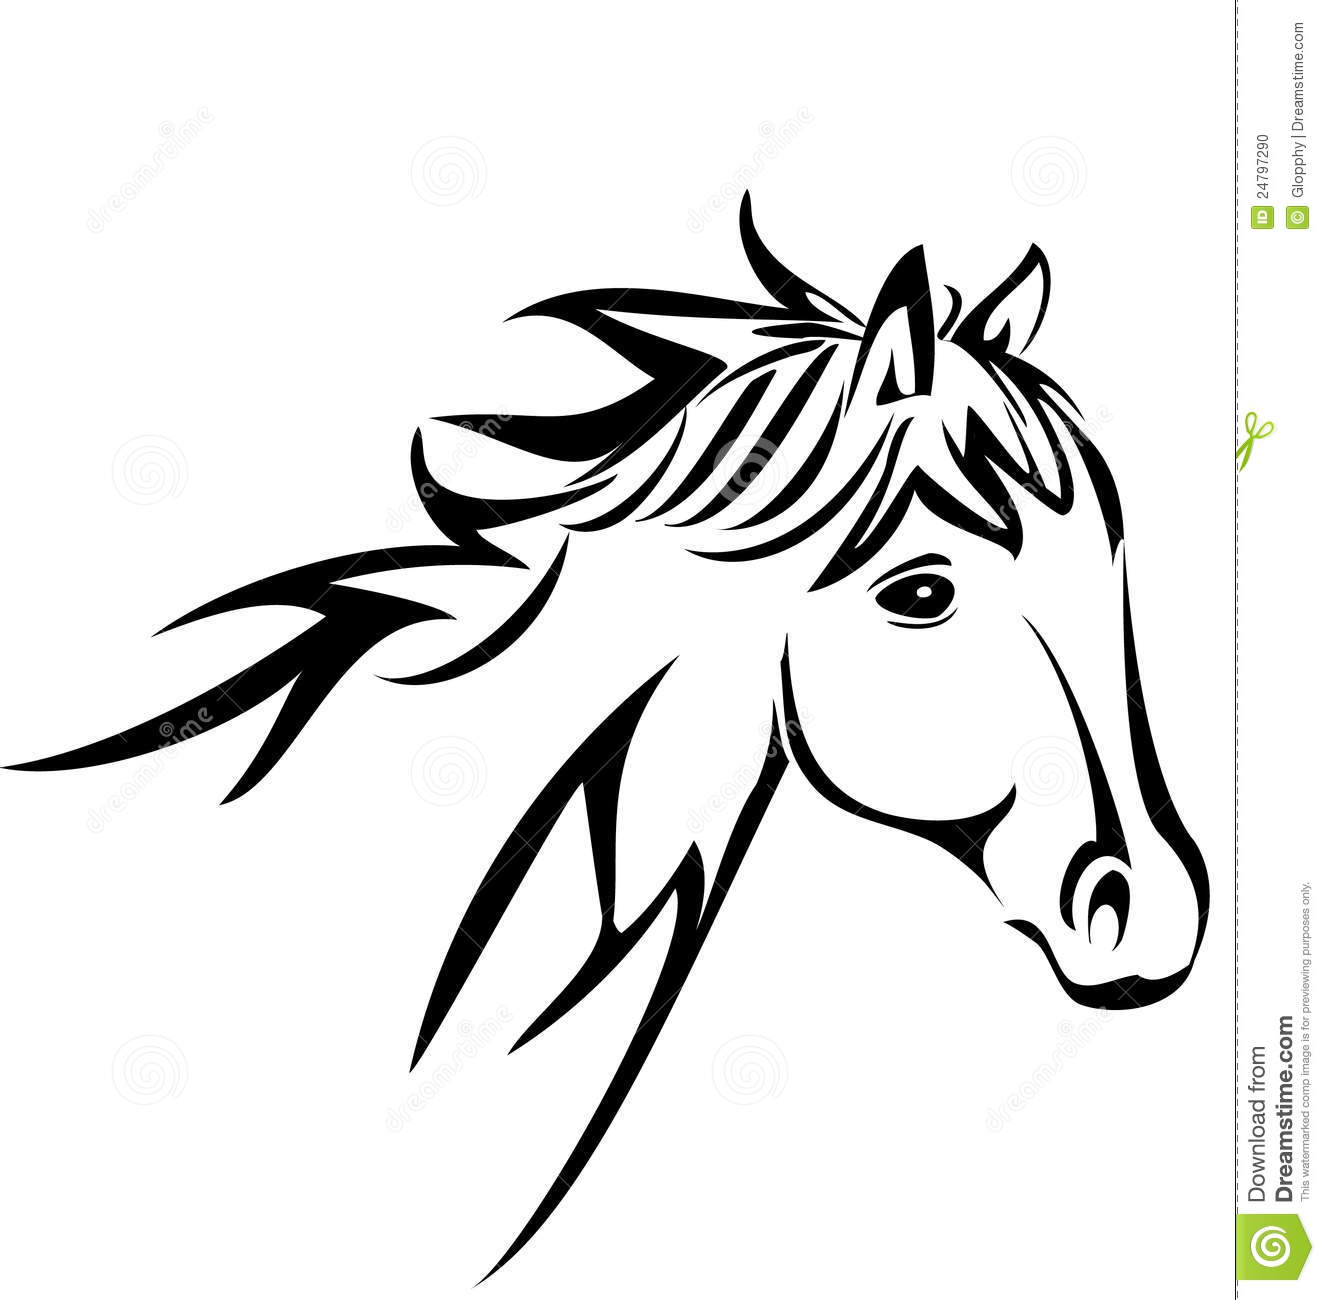 1325x1300 Arabian Horse Clip Art Horse Head Silhouette Stock Photo Image